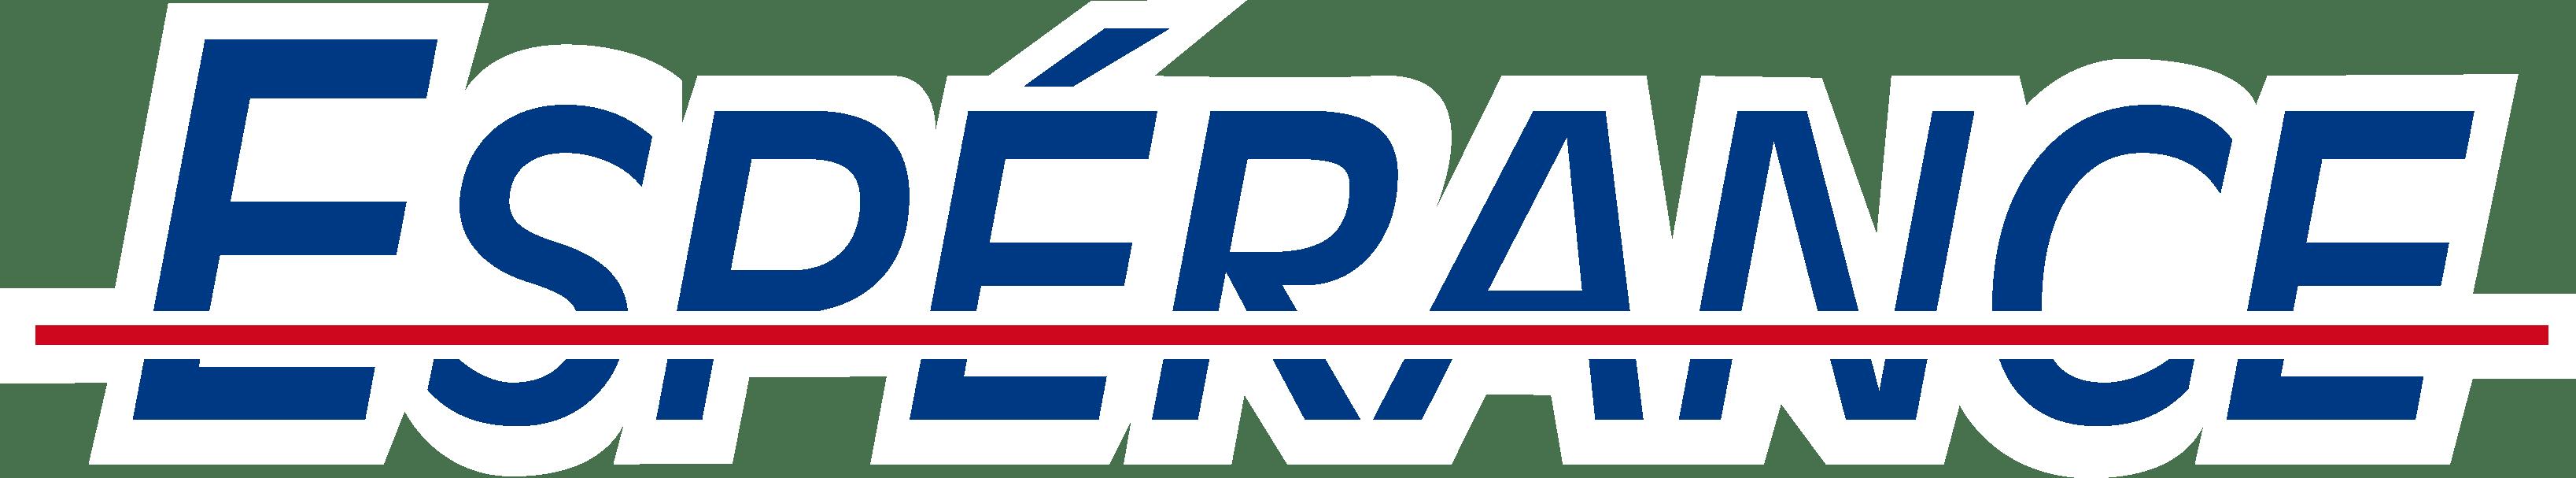 logotype-espérance_rvb.png